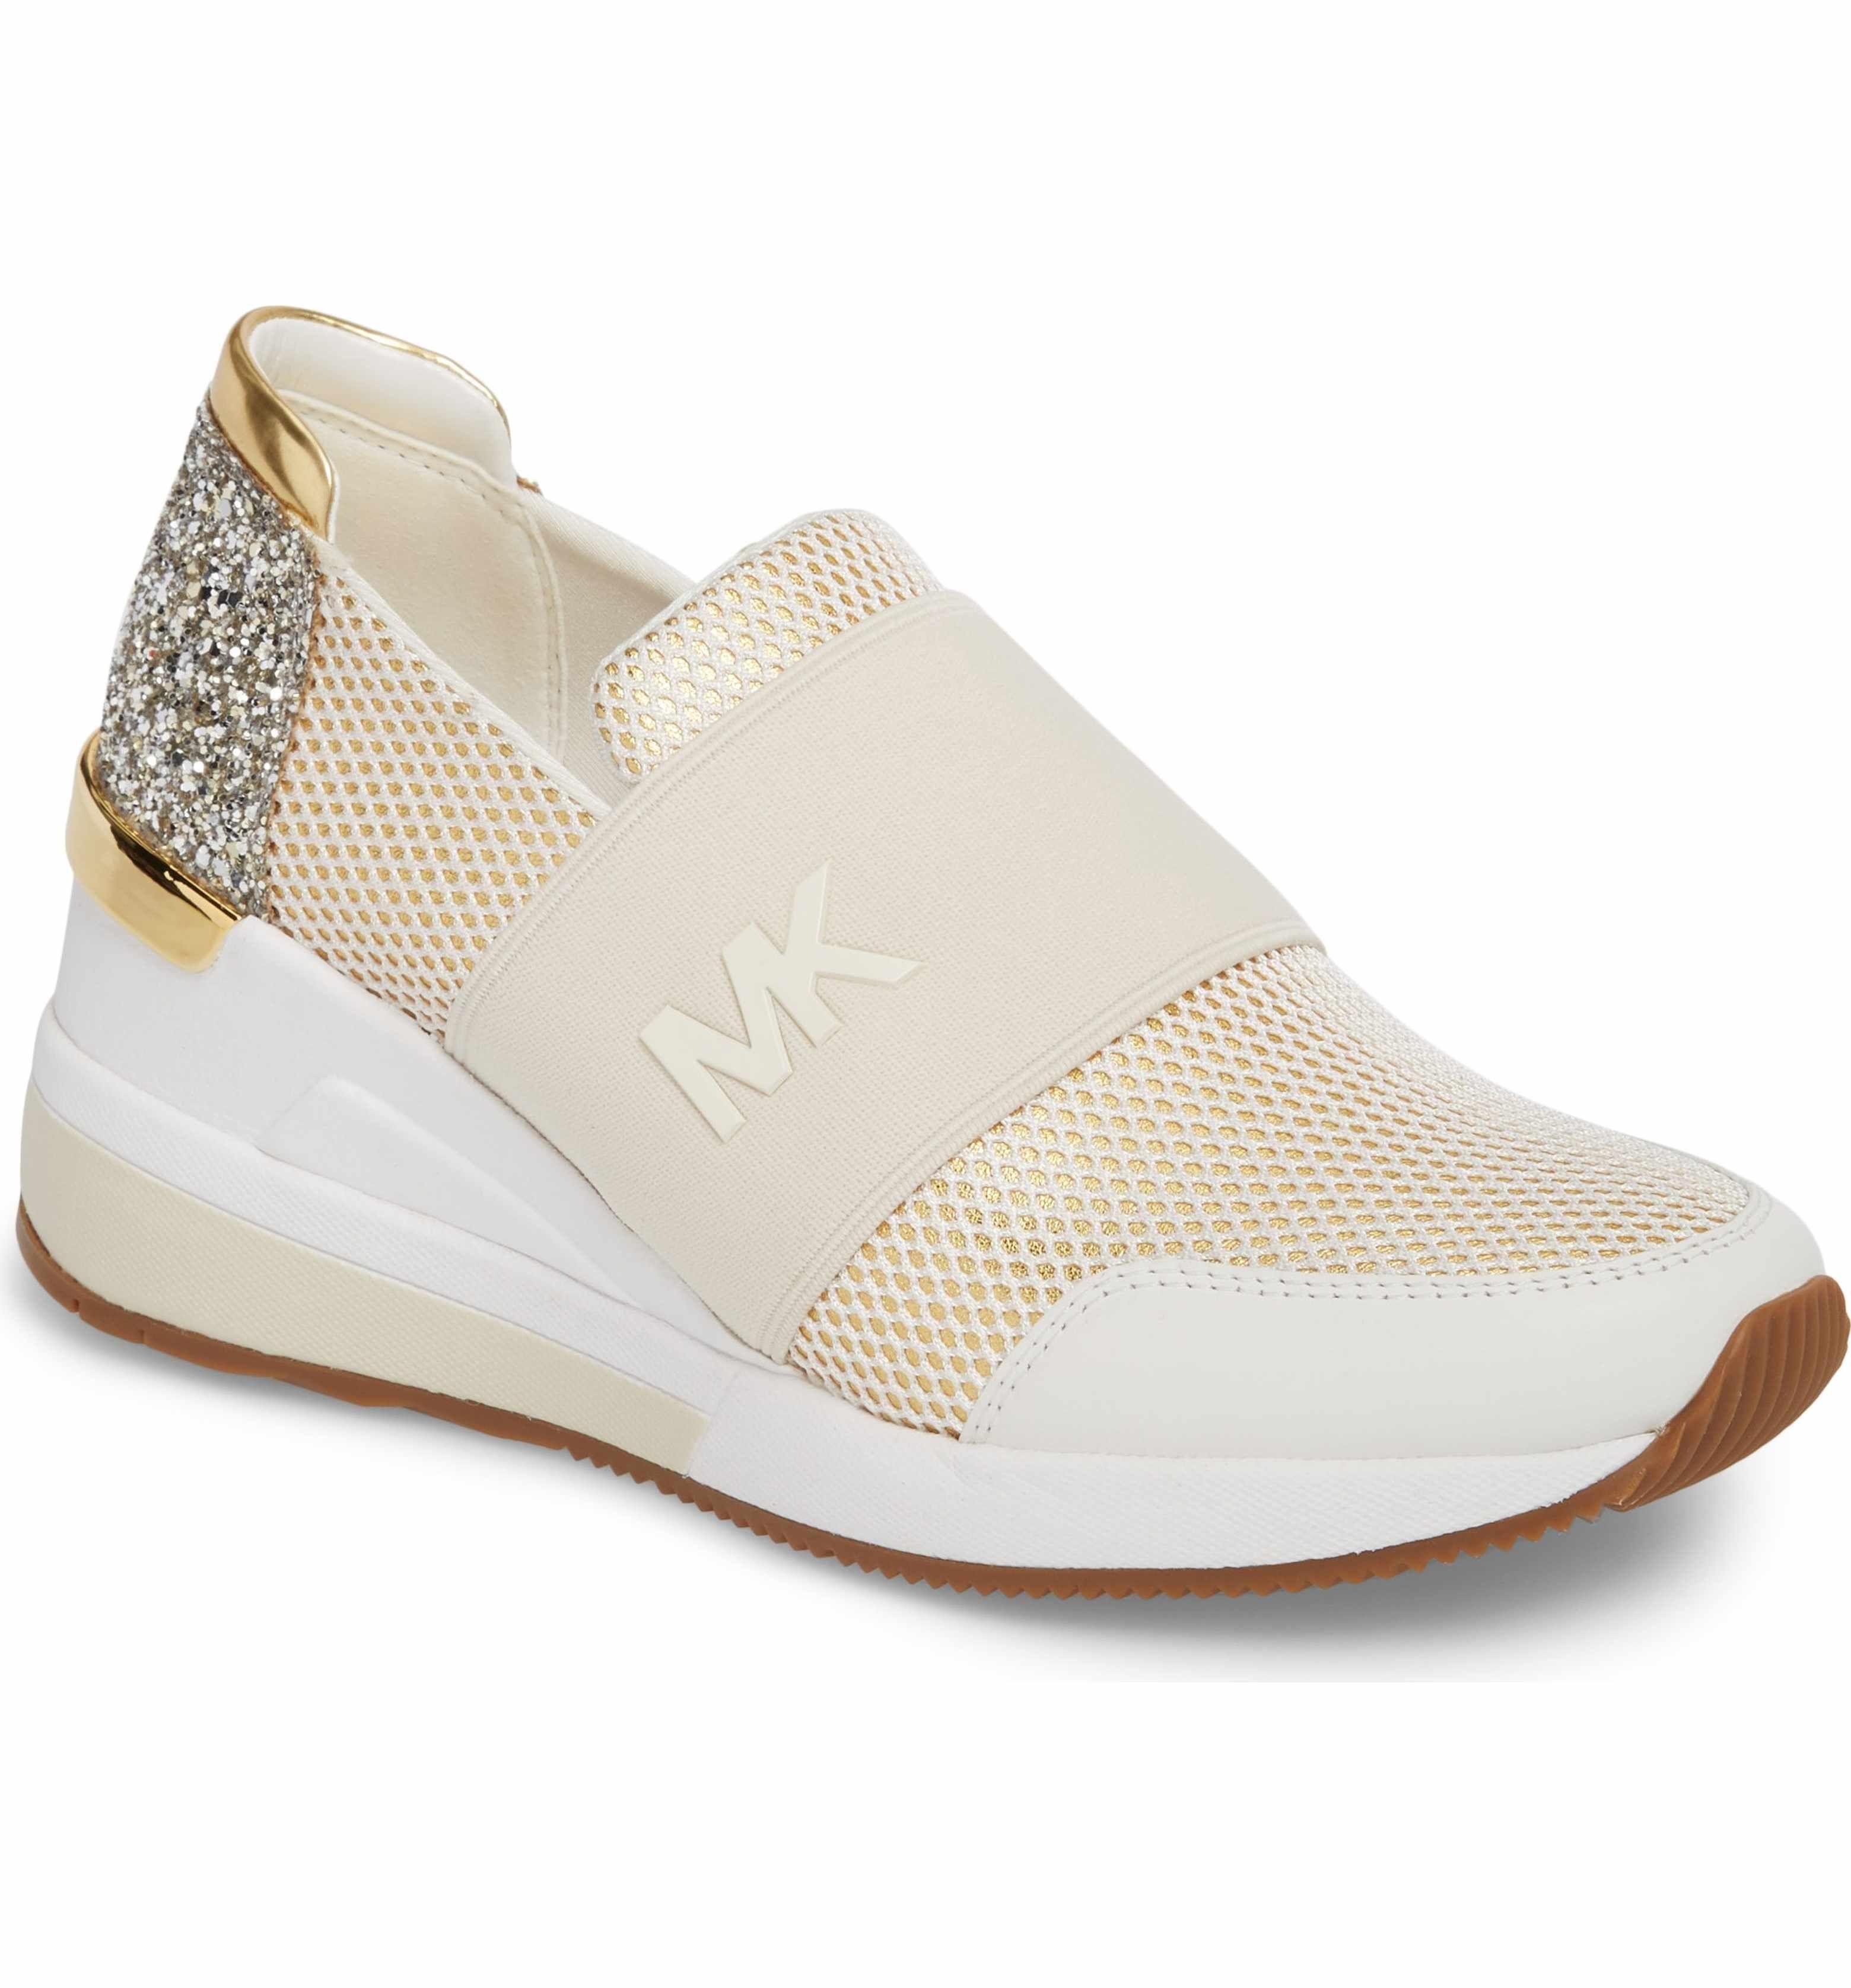 ba3c2a3b4c Main Image - MICHAEL Michael Kors Felix Slip-On Glitter Sneaker (Women)